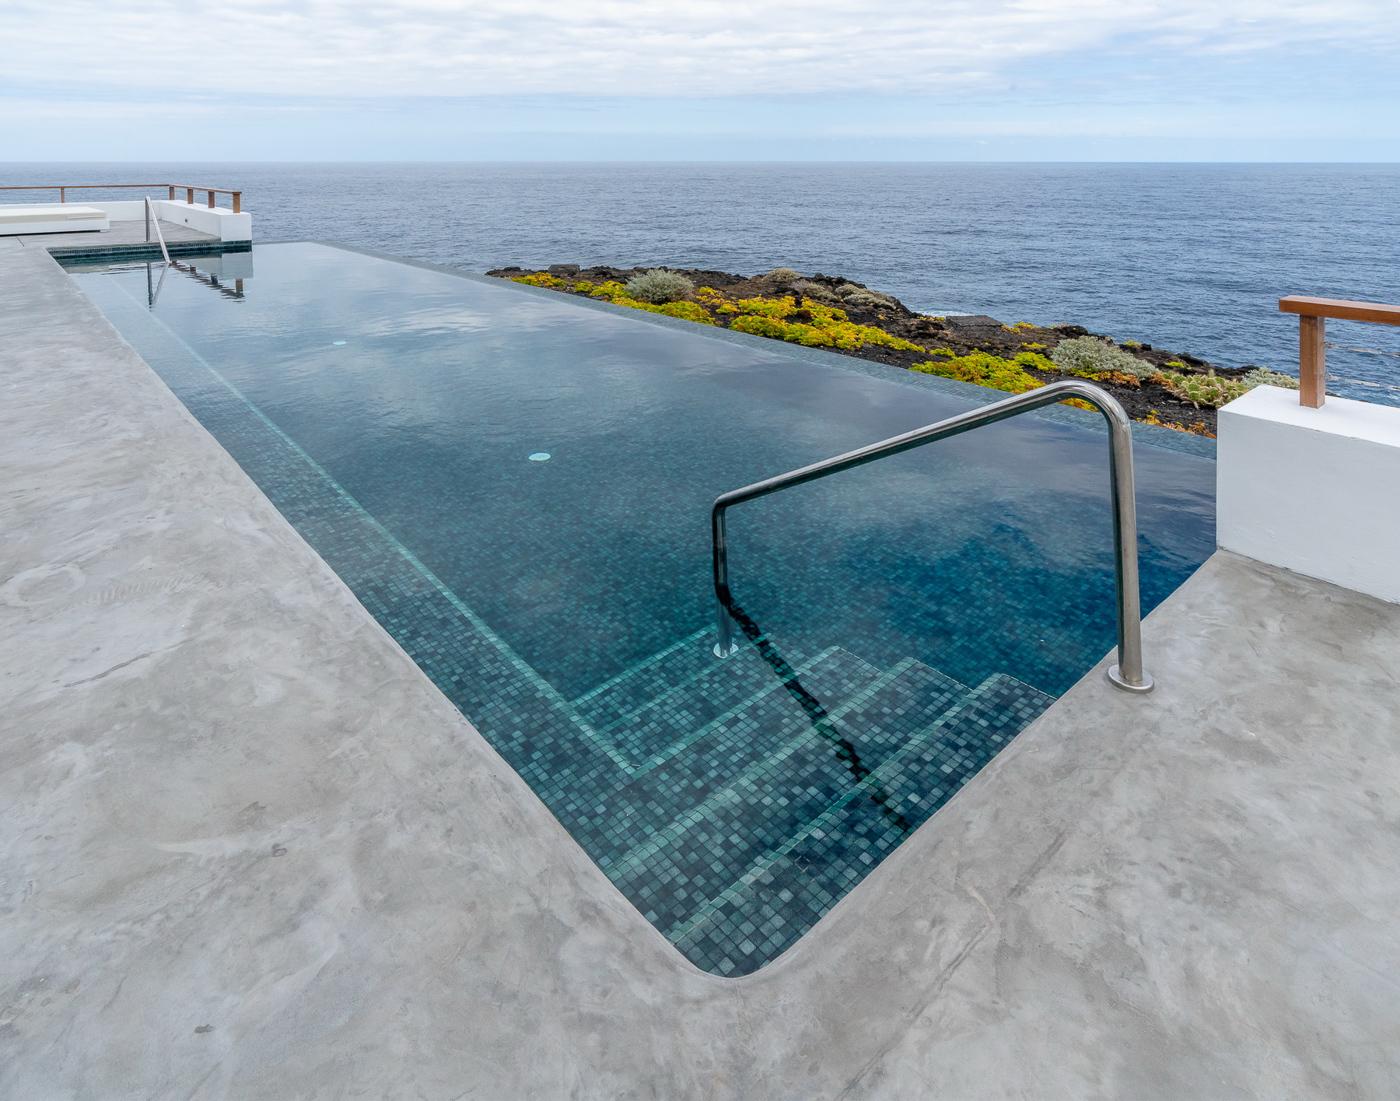 La piscina infinita.